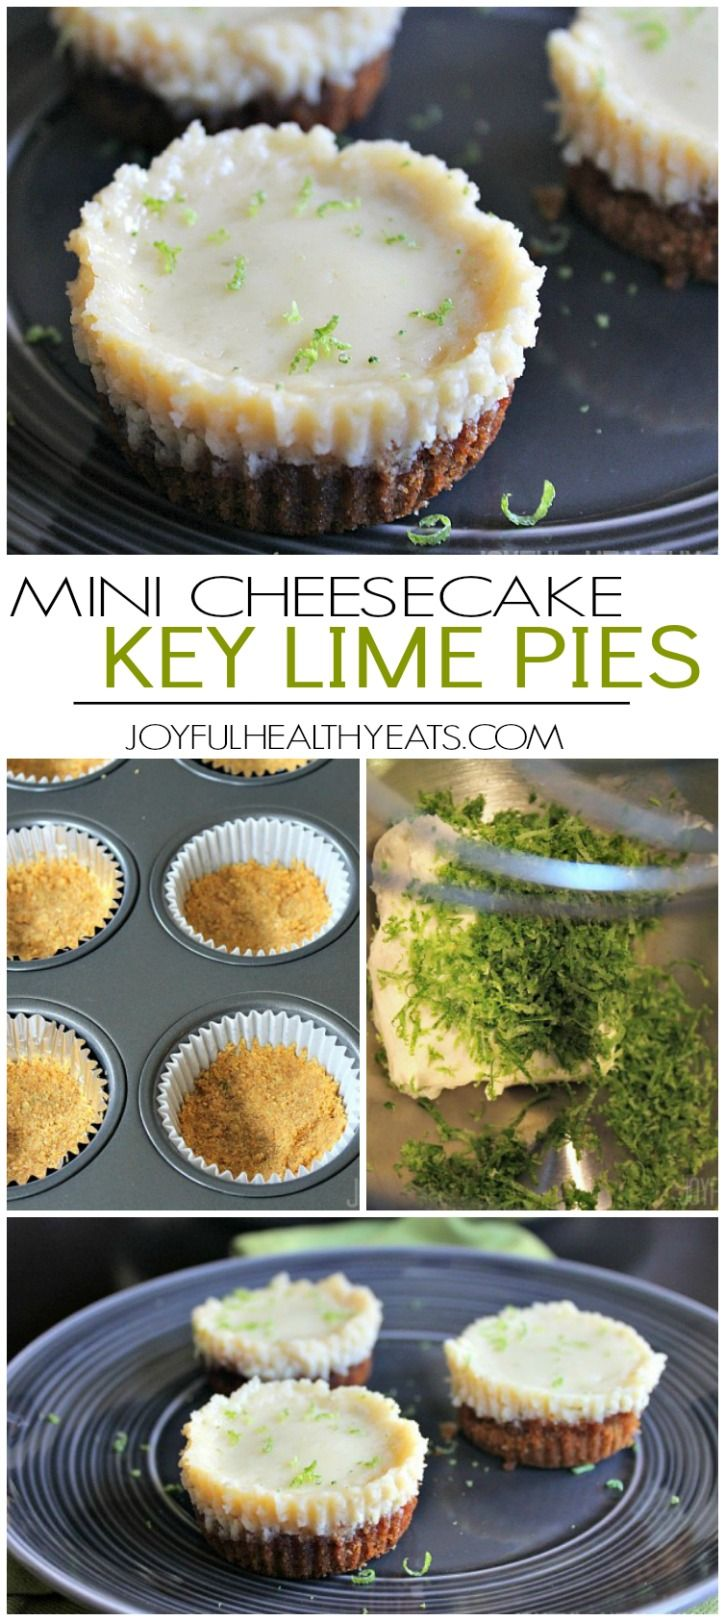 Easy to make Mini Cheesecake Key Lime Pie Bites, done in 30 minutes. The perfect bite size dessert!| joyfulhealthyeats.com #recipes